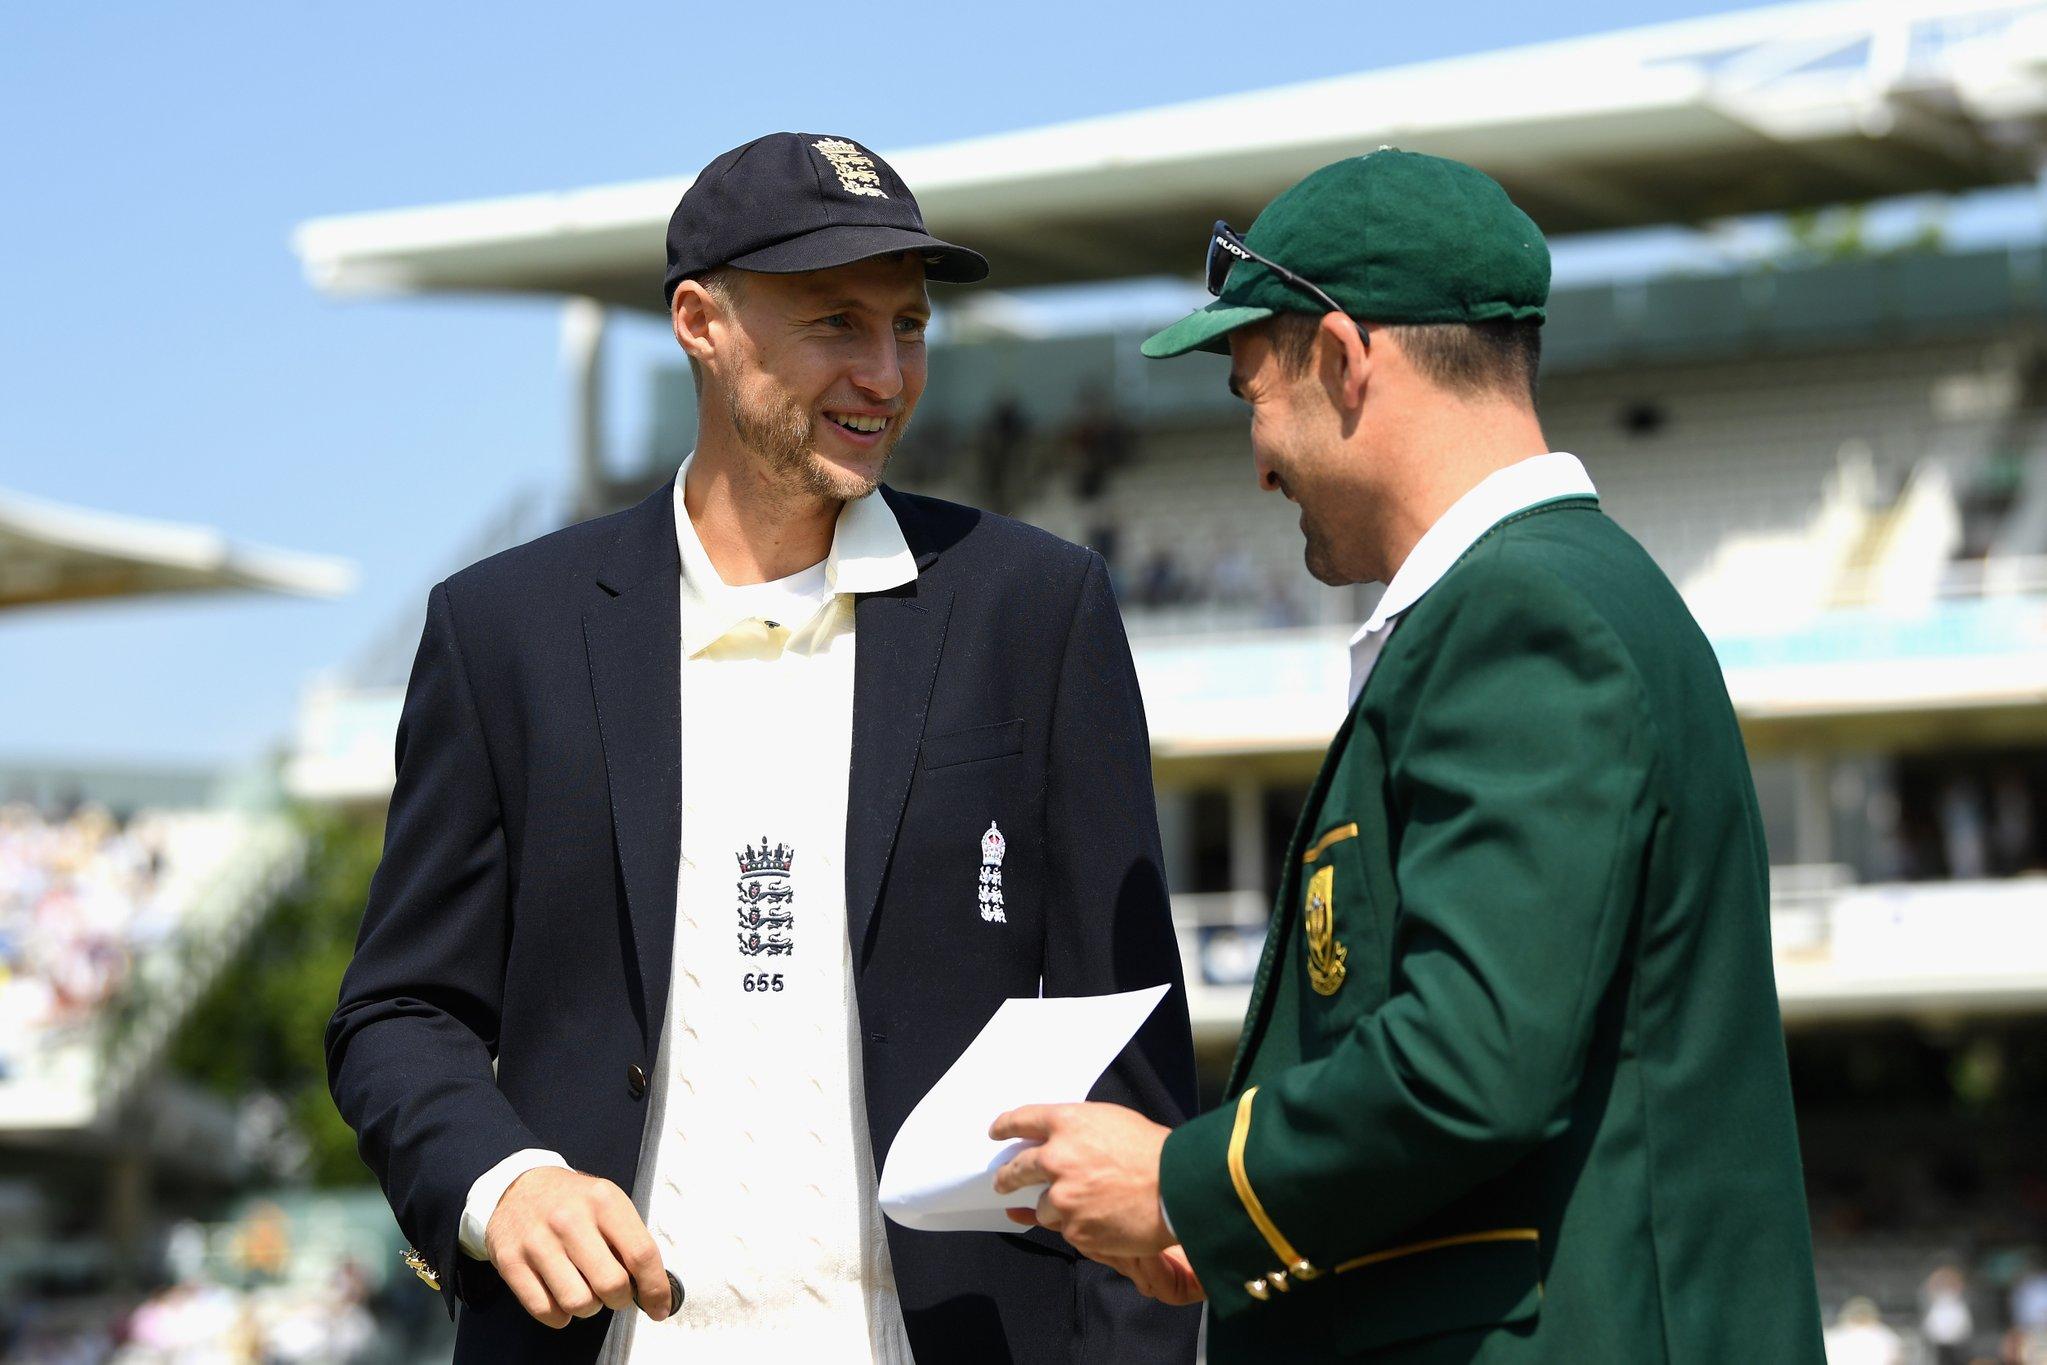 England v South Africa: Impressive captain Joe Root shows important qualities